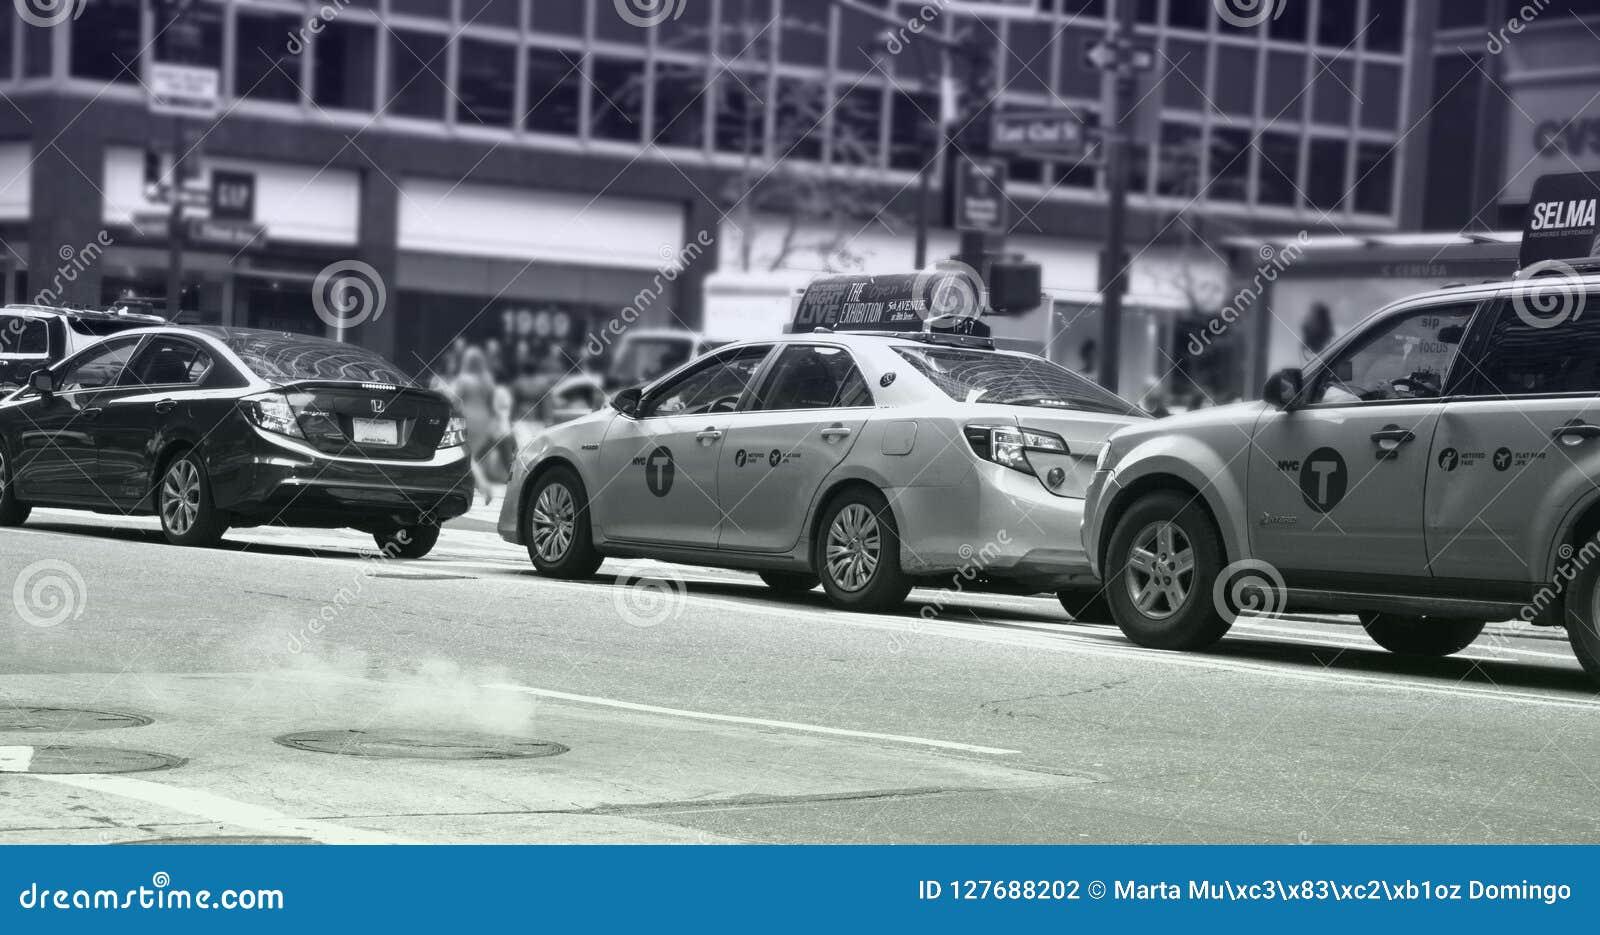 Vapor que aumenta das ruas de NYC